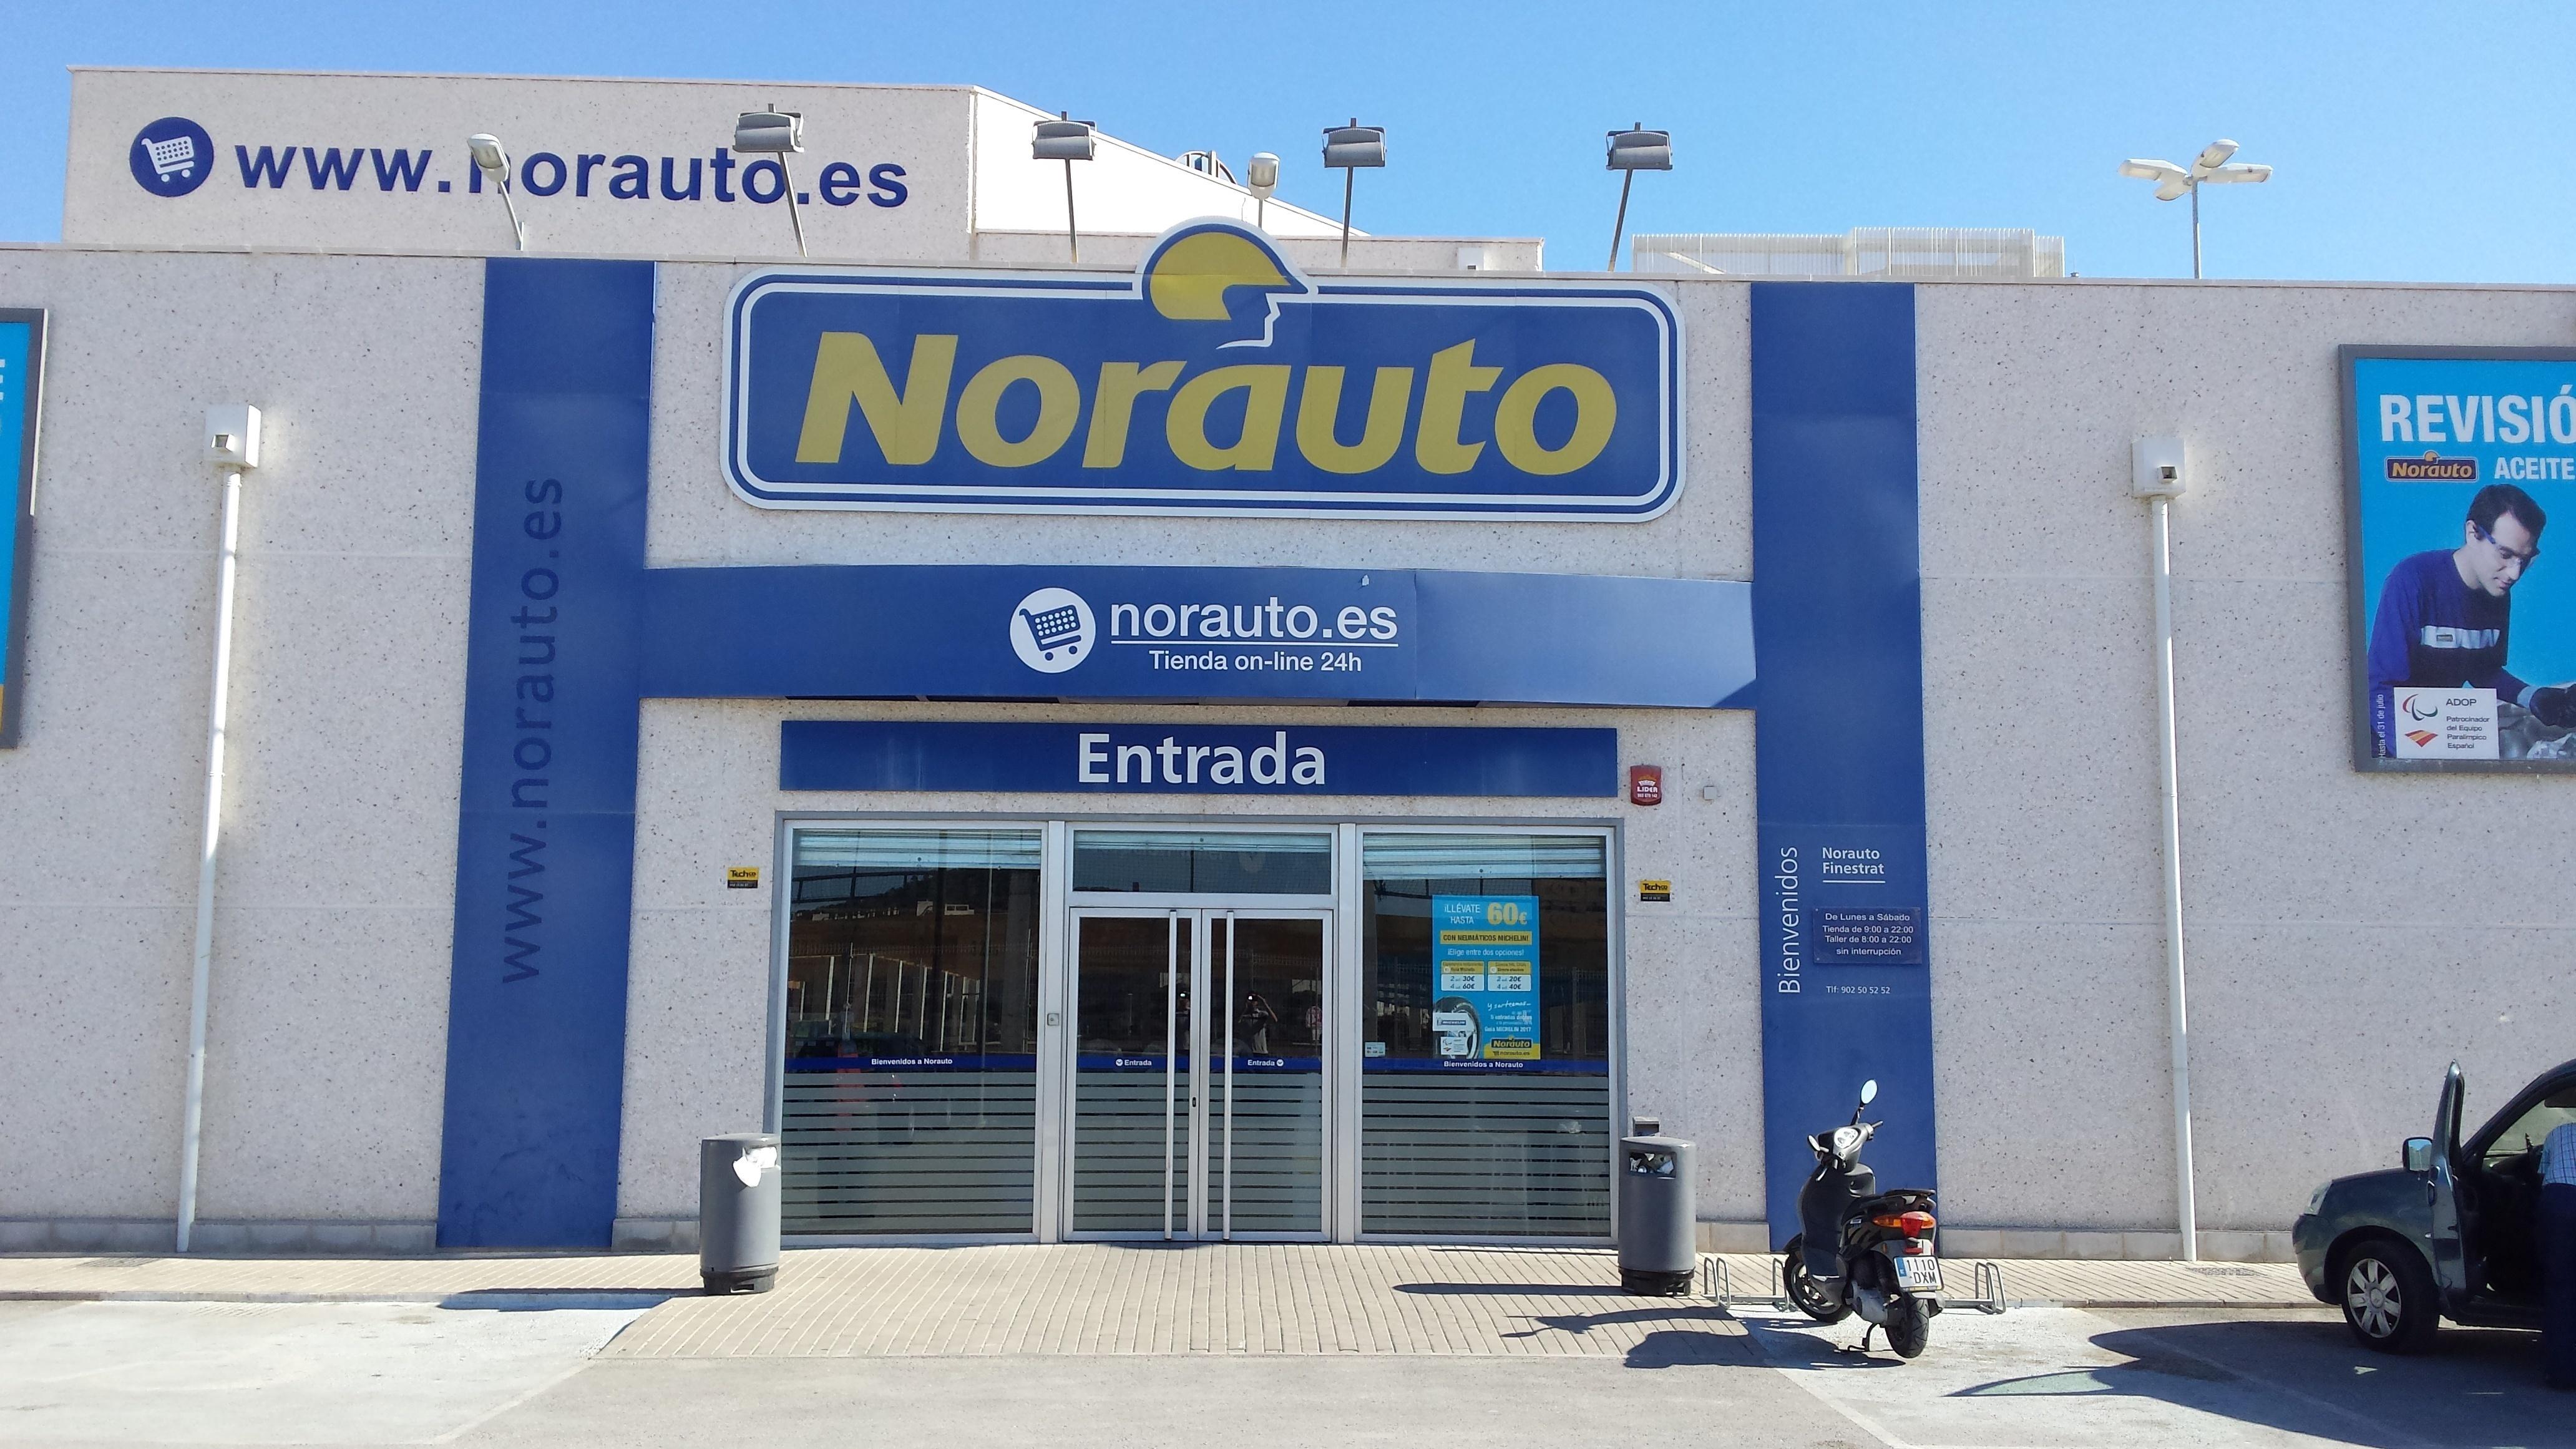 Norauto Finestrat